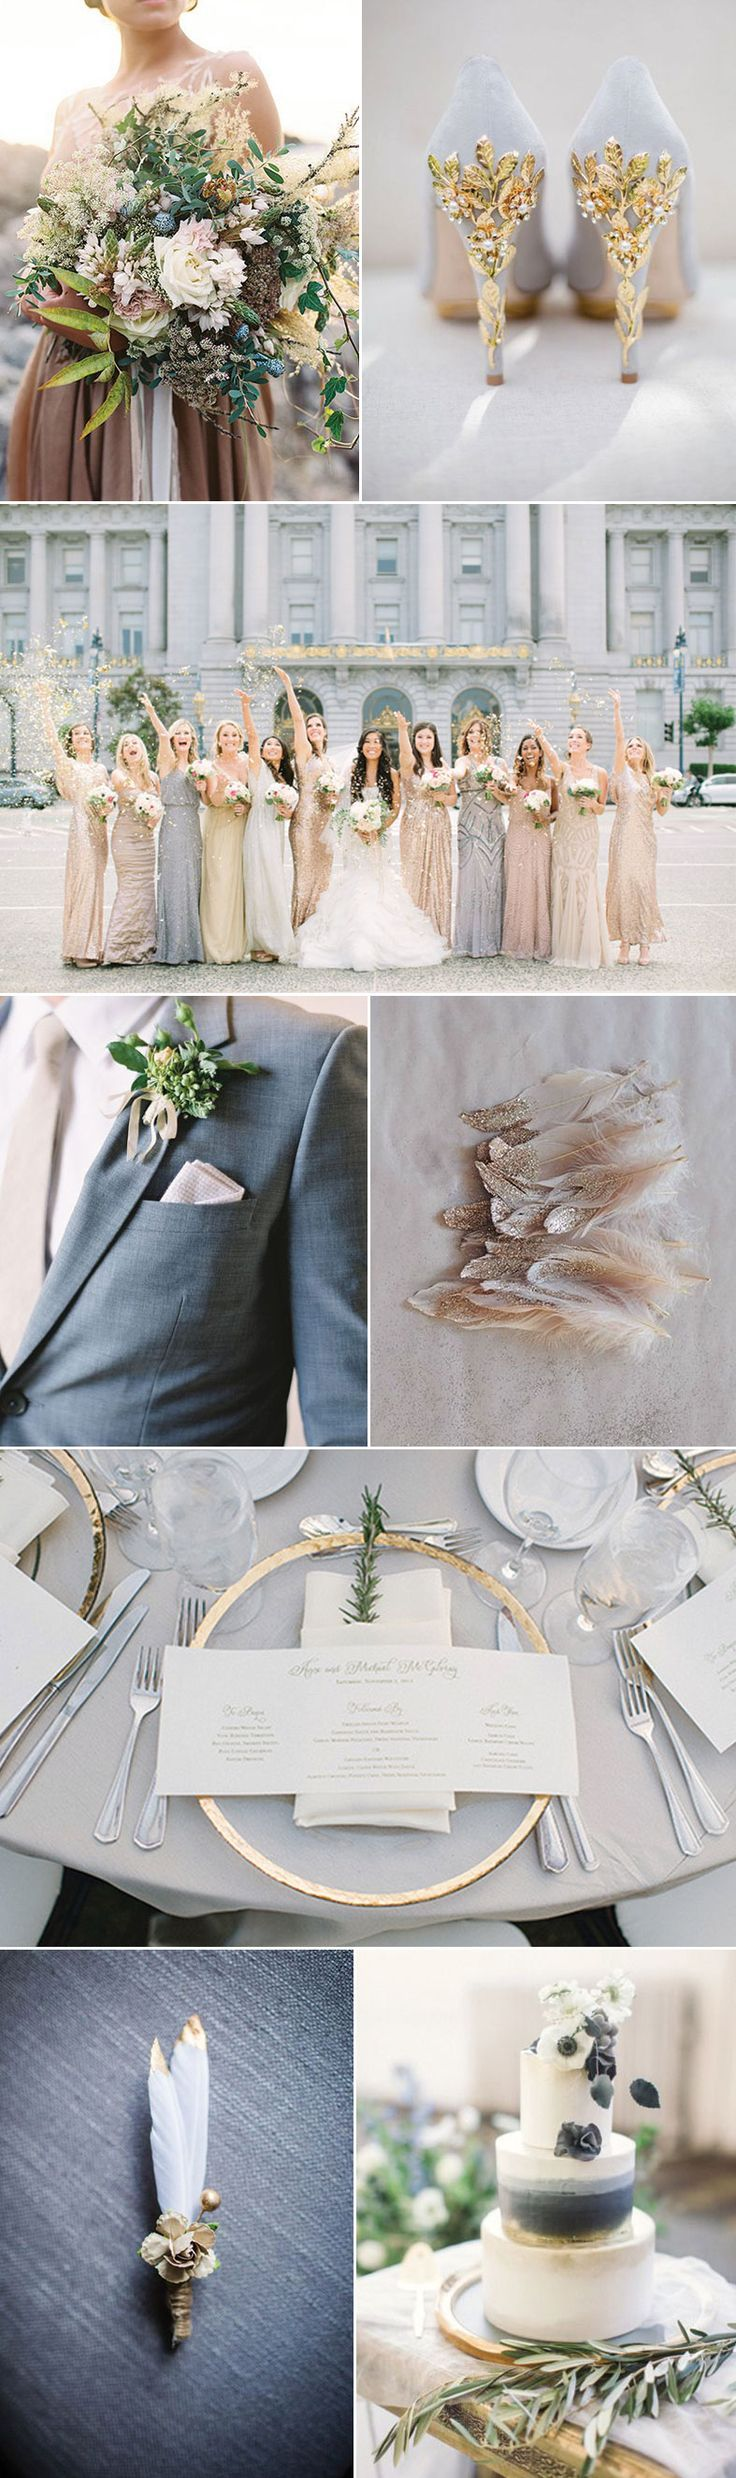 63 best Wedding Inspiration images on Pinterest | Wedding decor ...